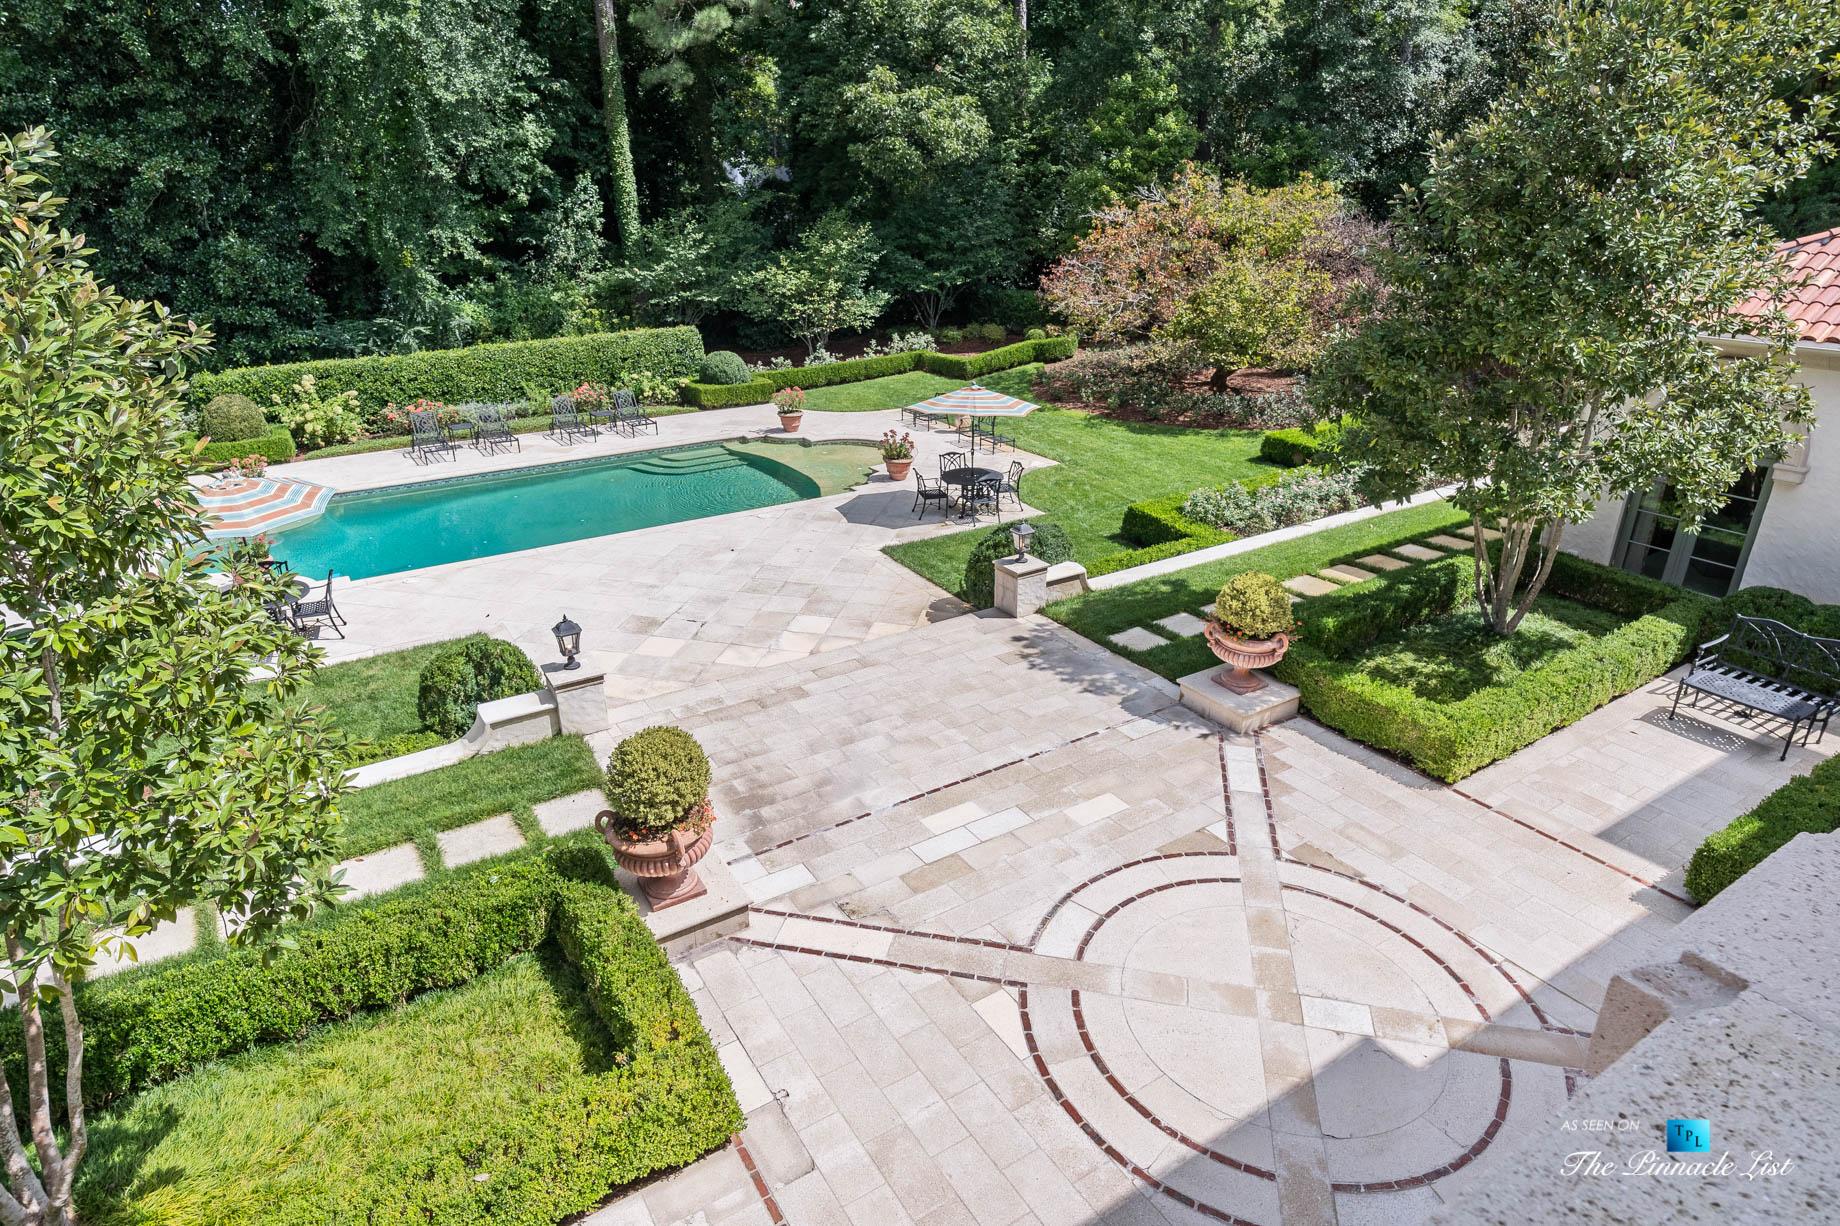 439 Blackland Rd NW, Atlanta, GA, USA – Private Backyard with Pool – Luxury Real Estate – Tuxedo Park Mediterranean Mansion Home